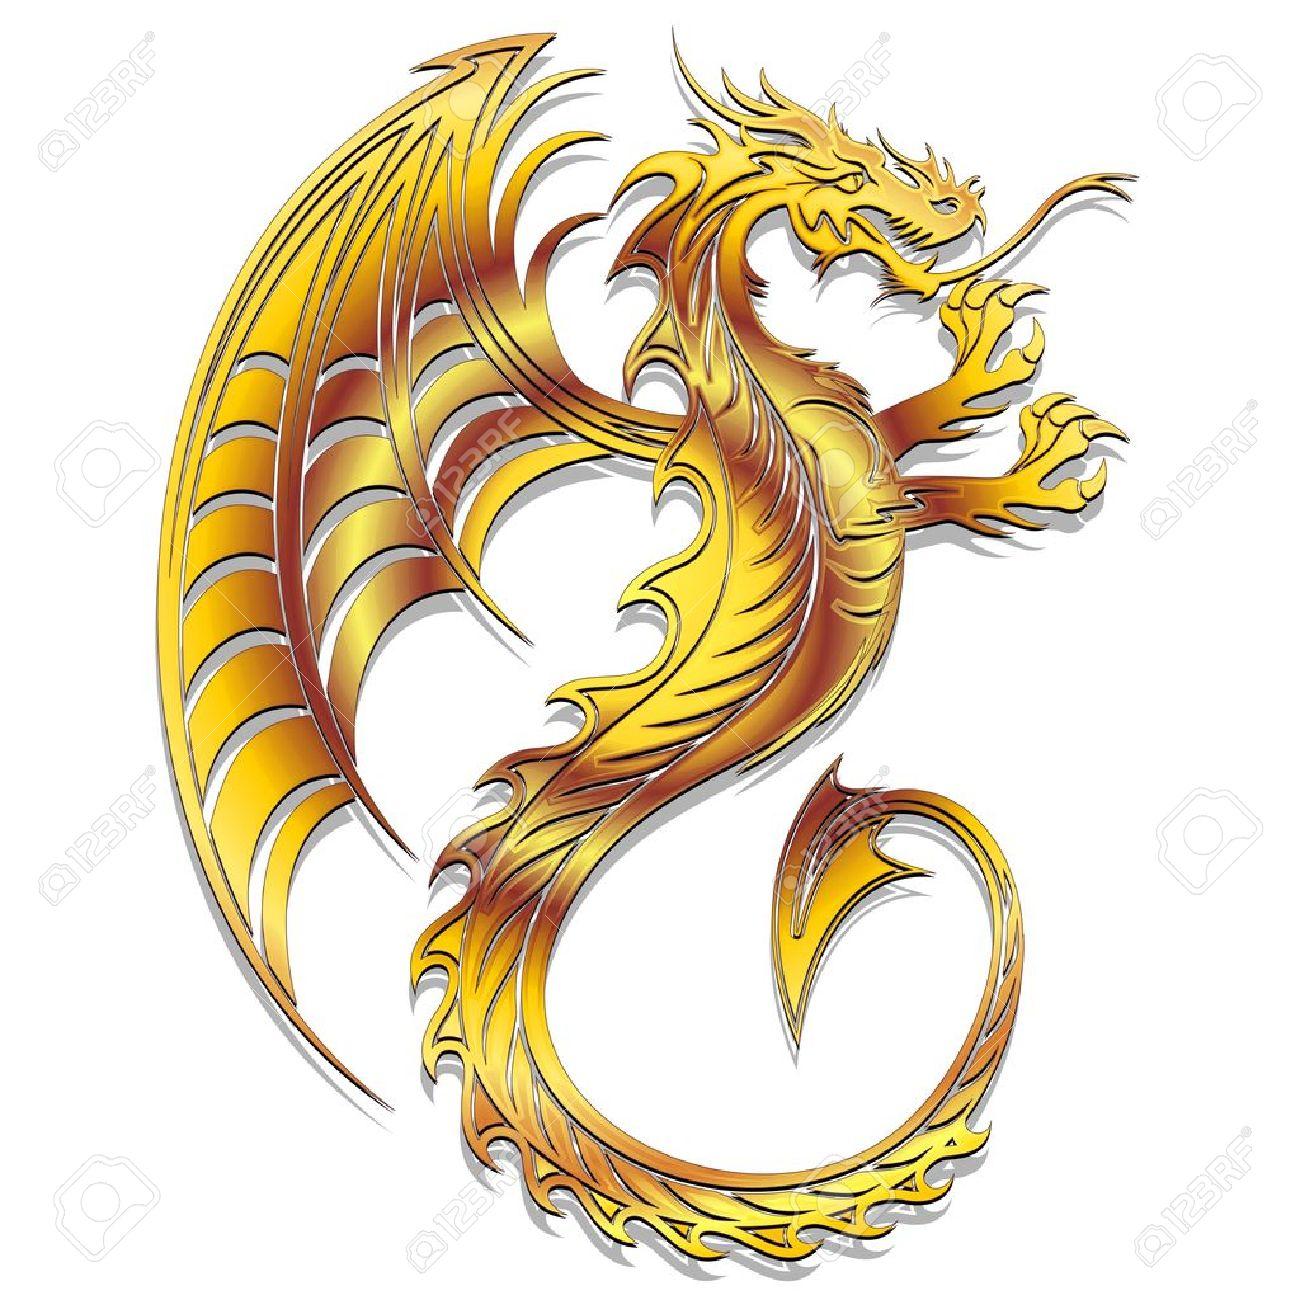 [Image: 11935713-golden-dragon-symbol-2012.jpg]